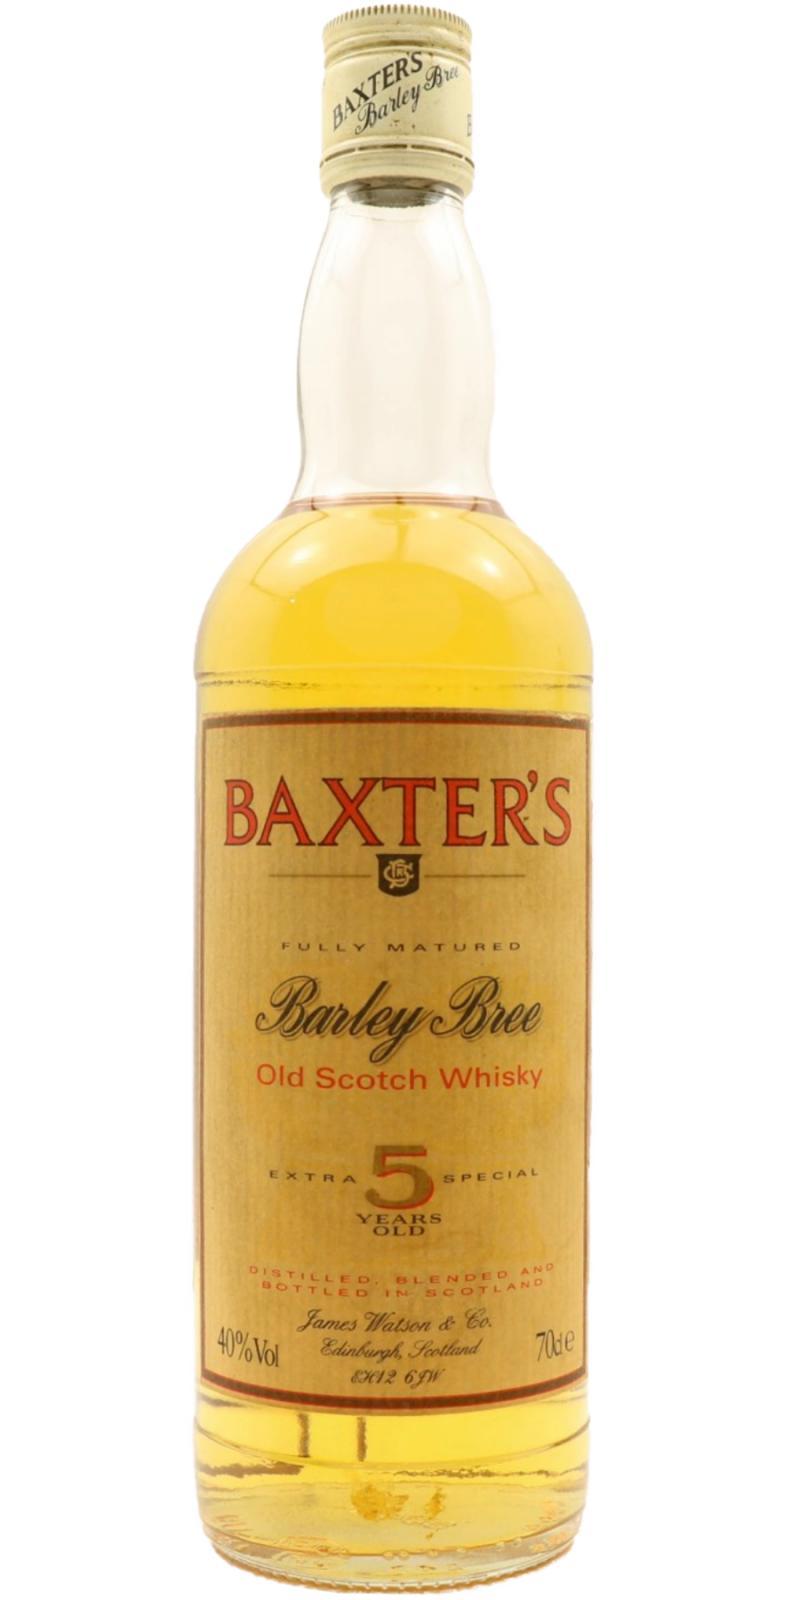 Baxter's 05-year-old - Barley Bree